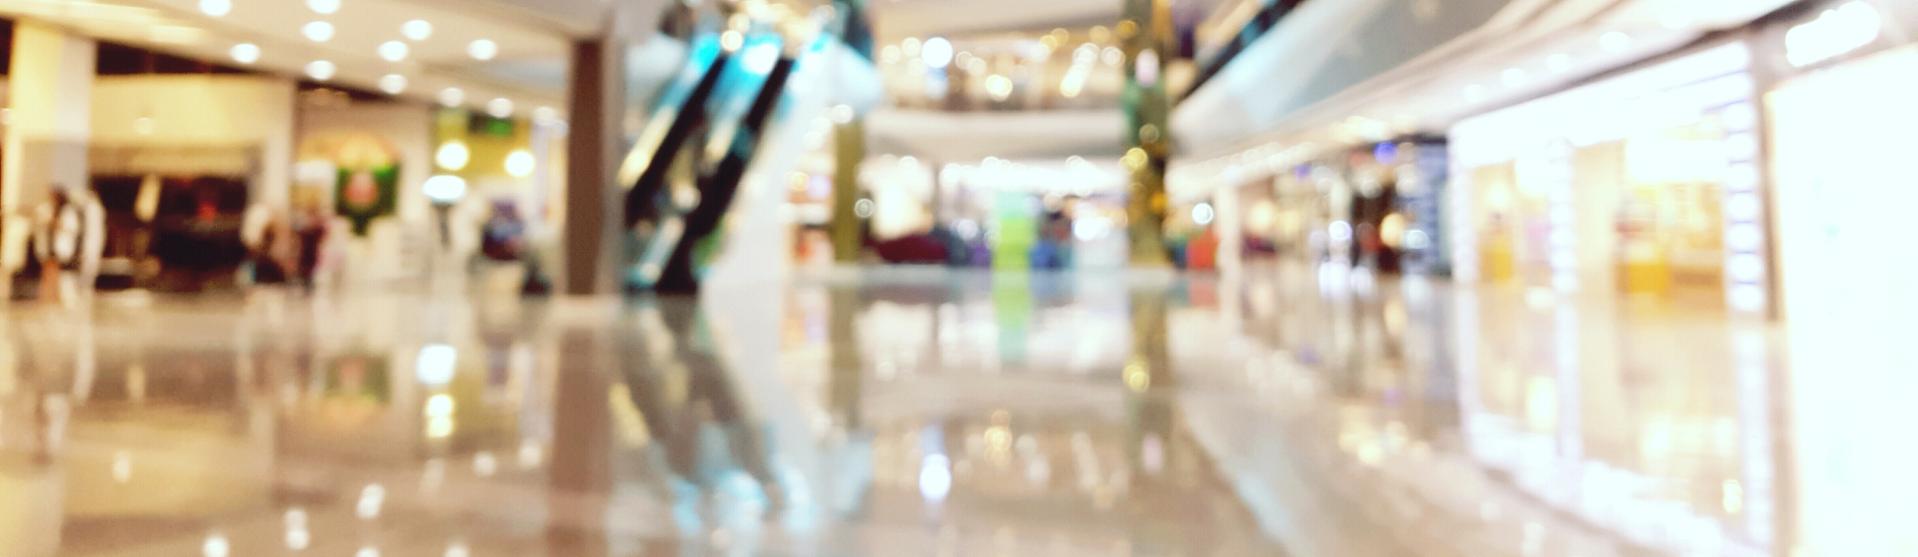 Photo of mall hallway